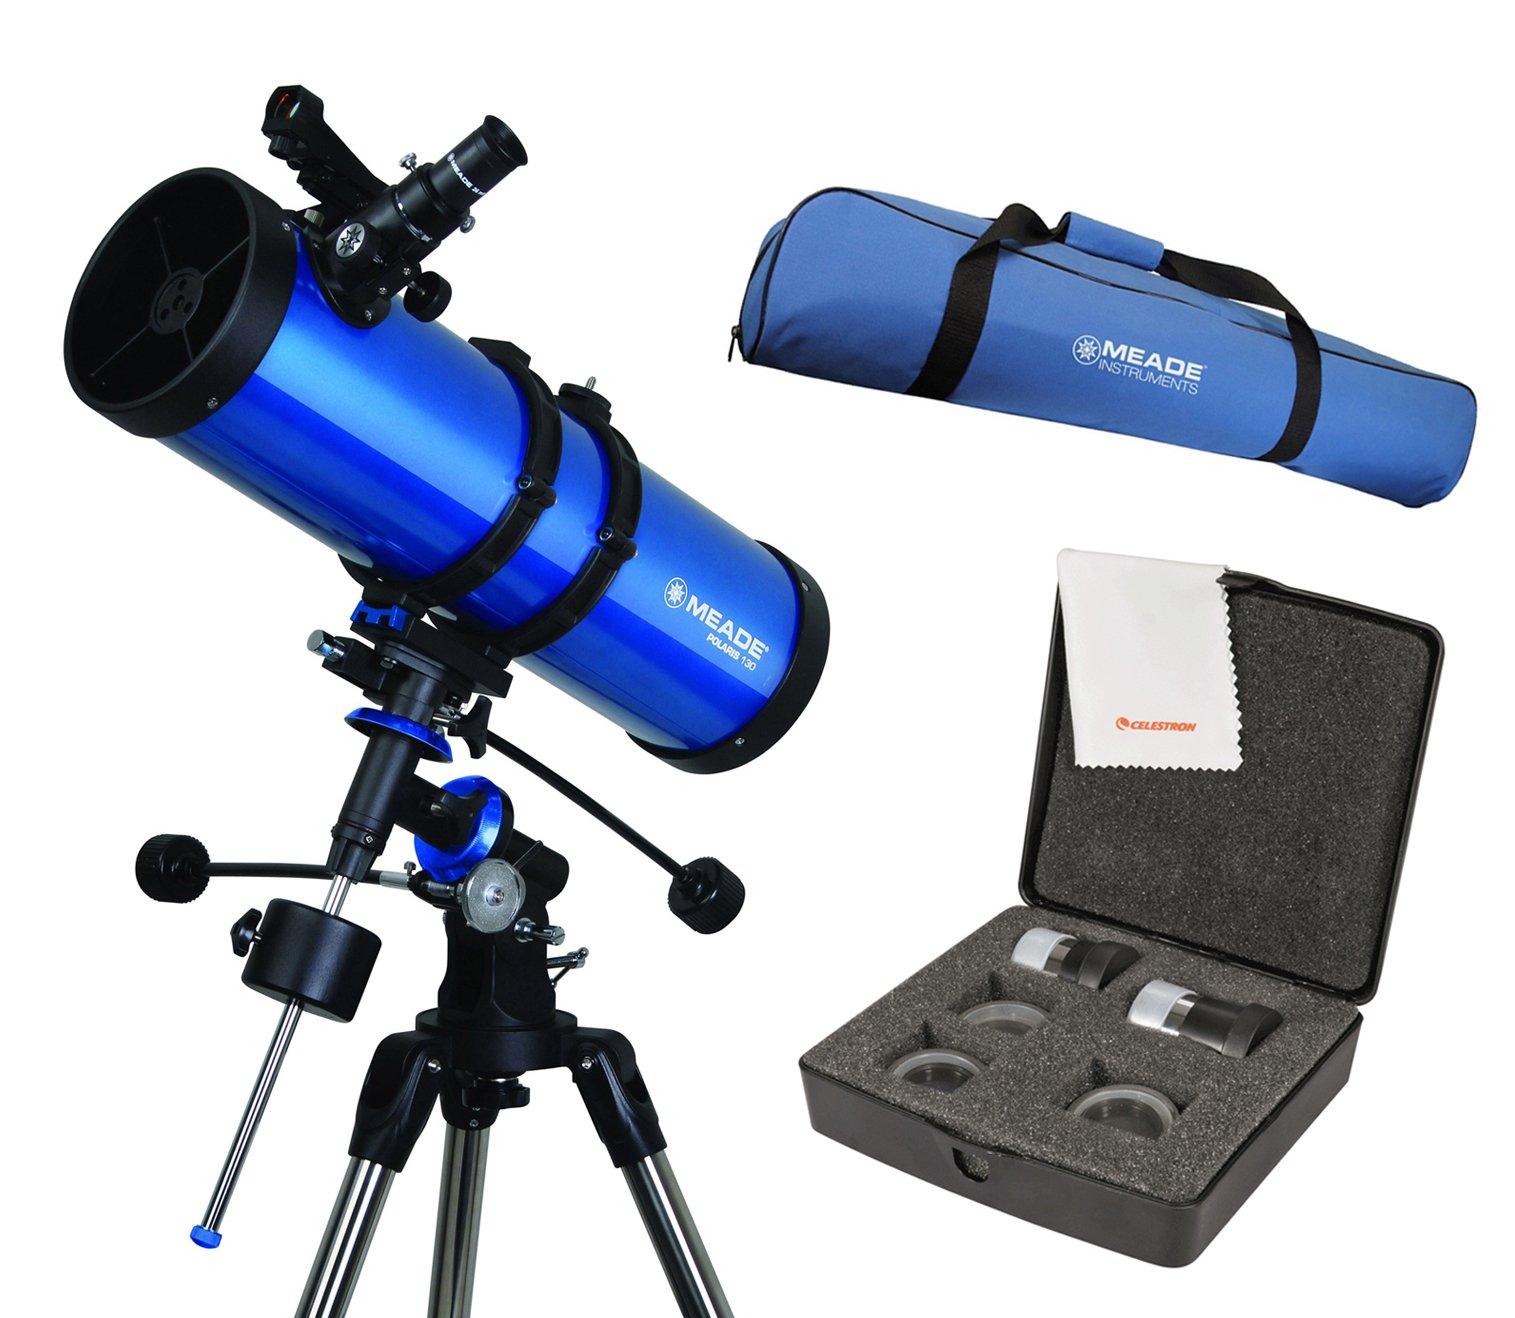 Meade Polaris 130mmTelescope w/ Travel Bag & Eyepiece Accessory Kit by Meade